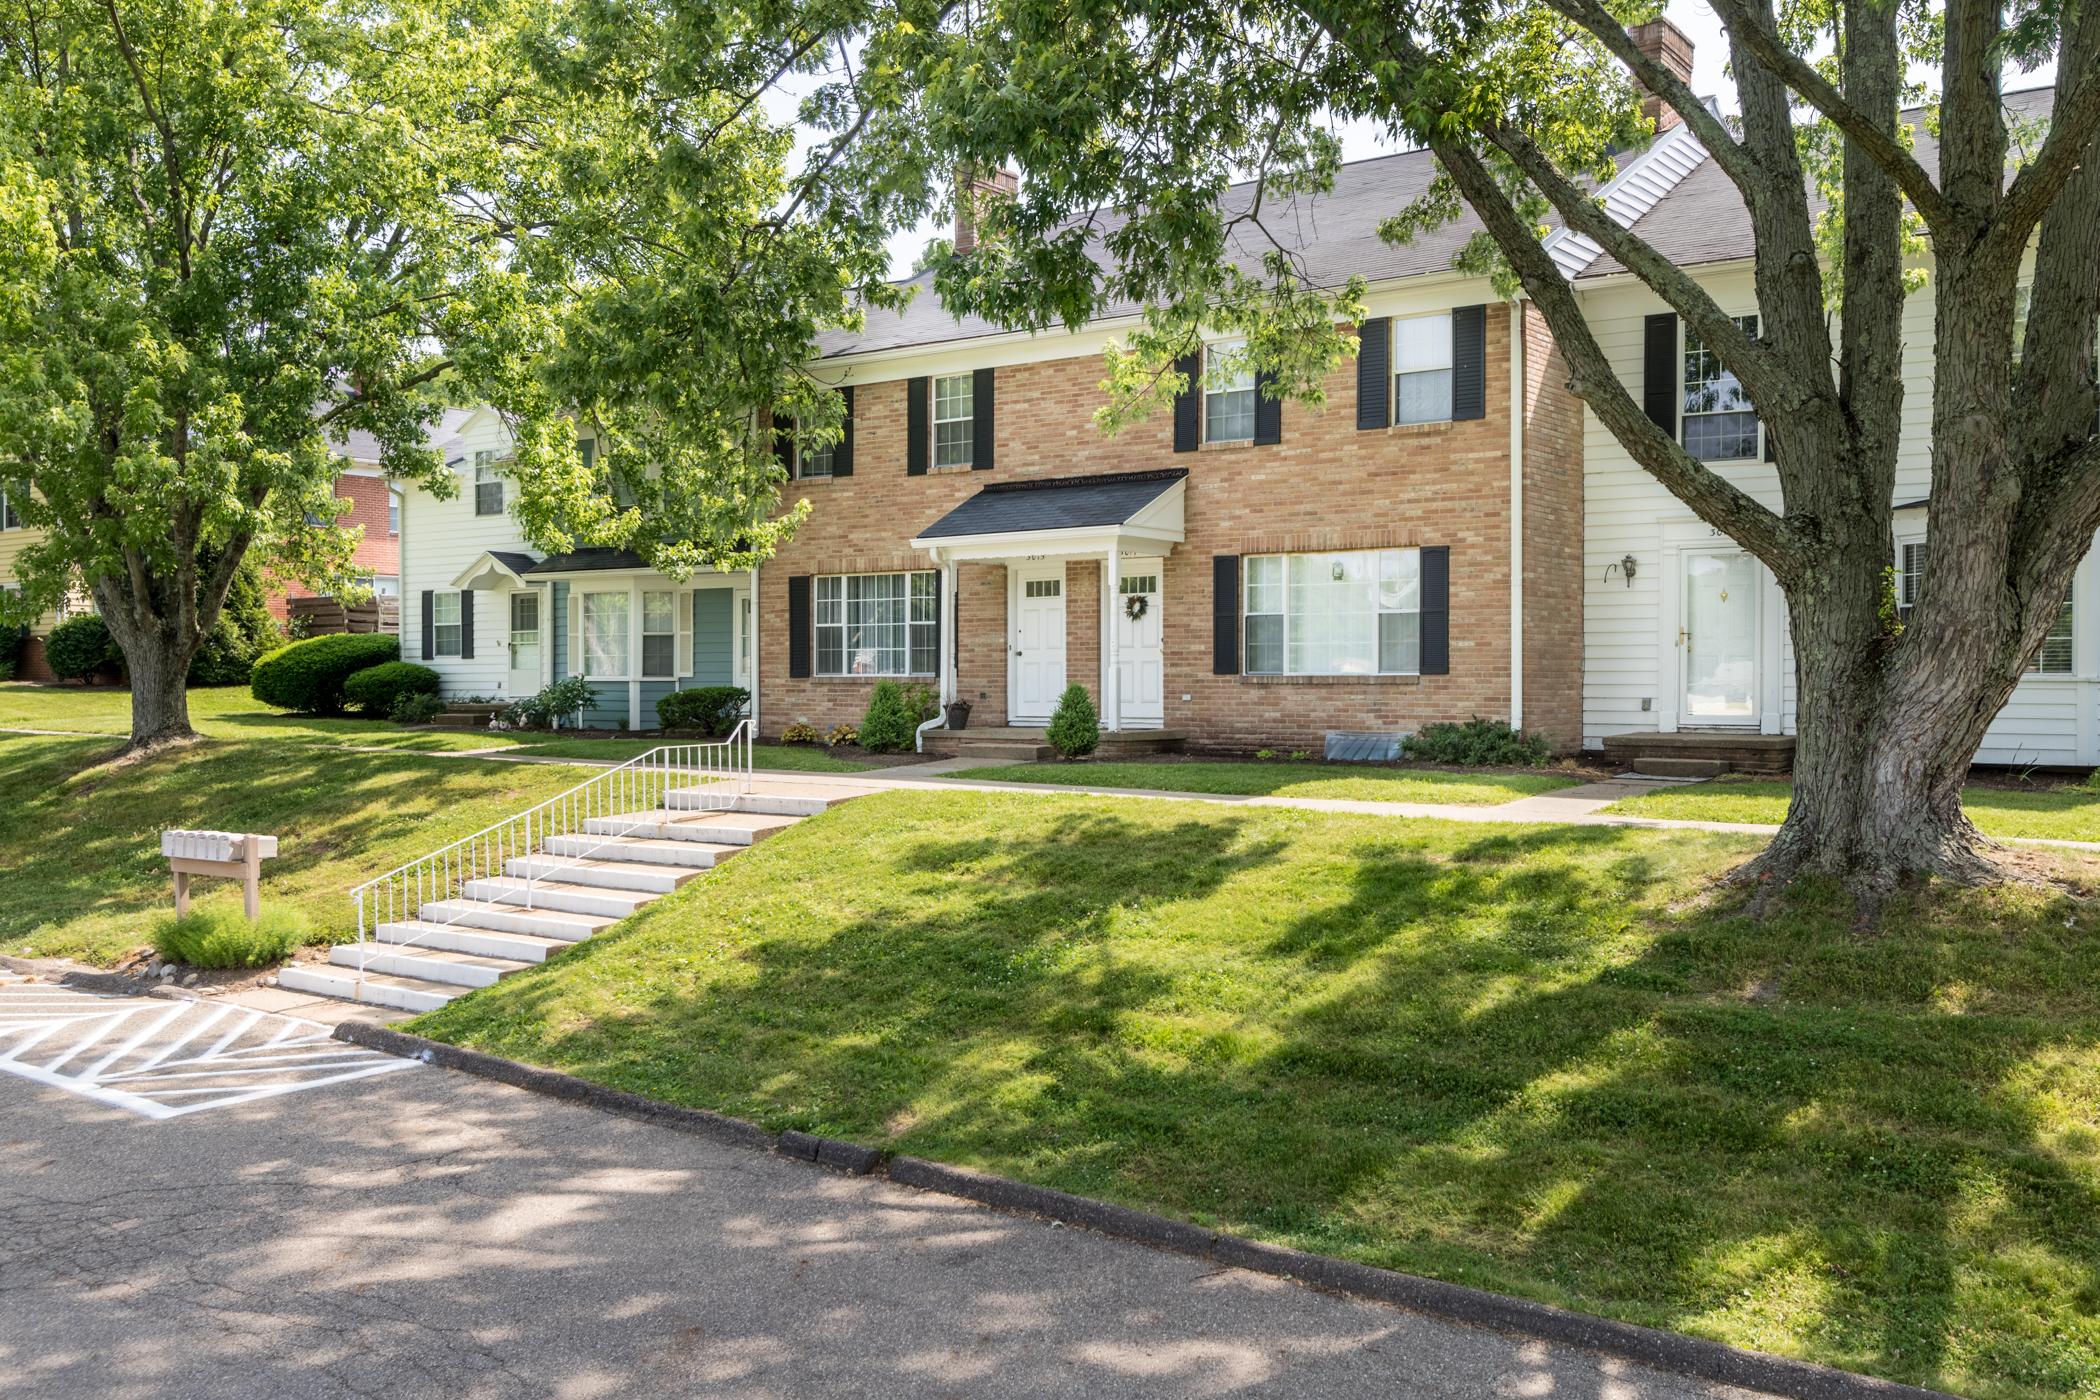 Woodside Terrace Apartments - Canton, Ohio239 units